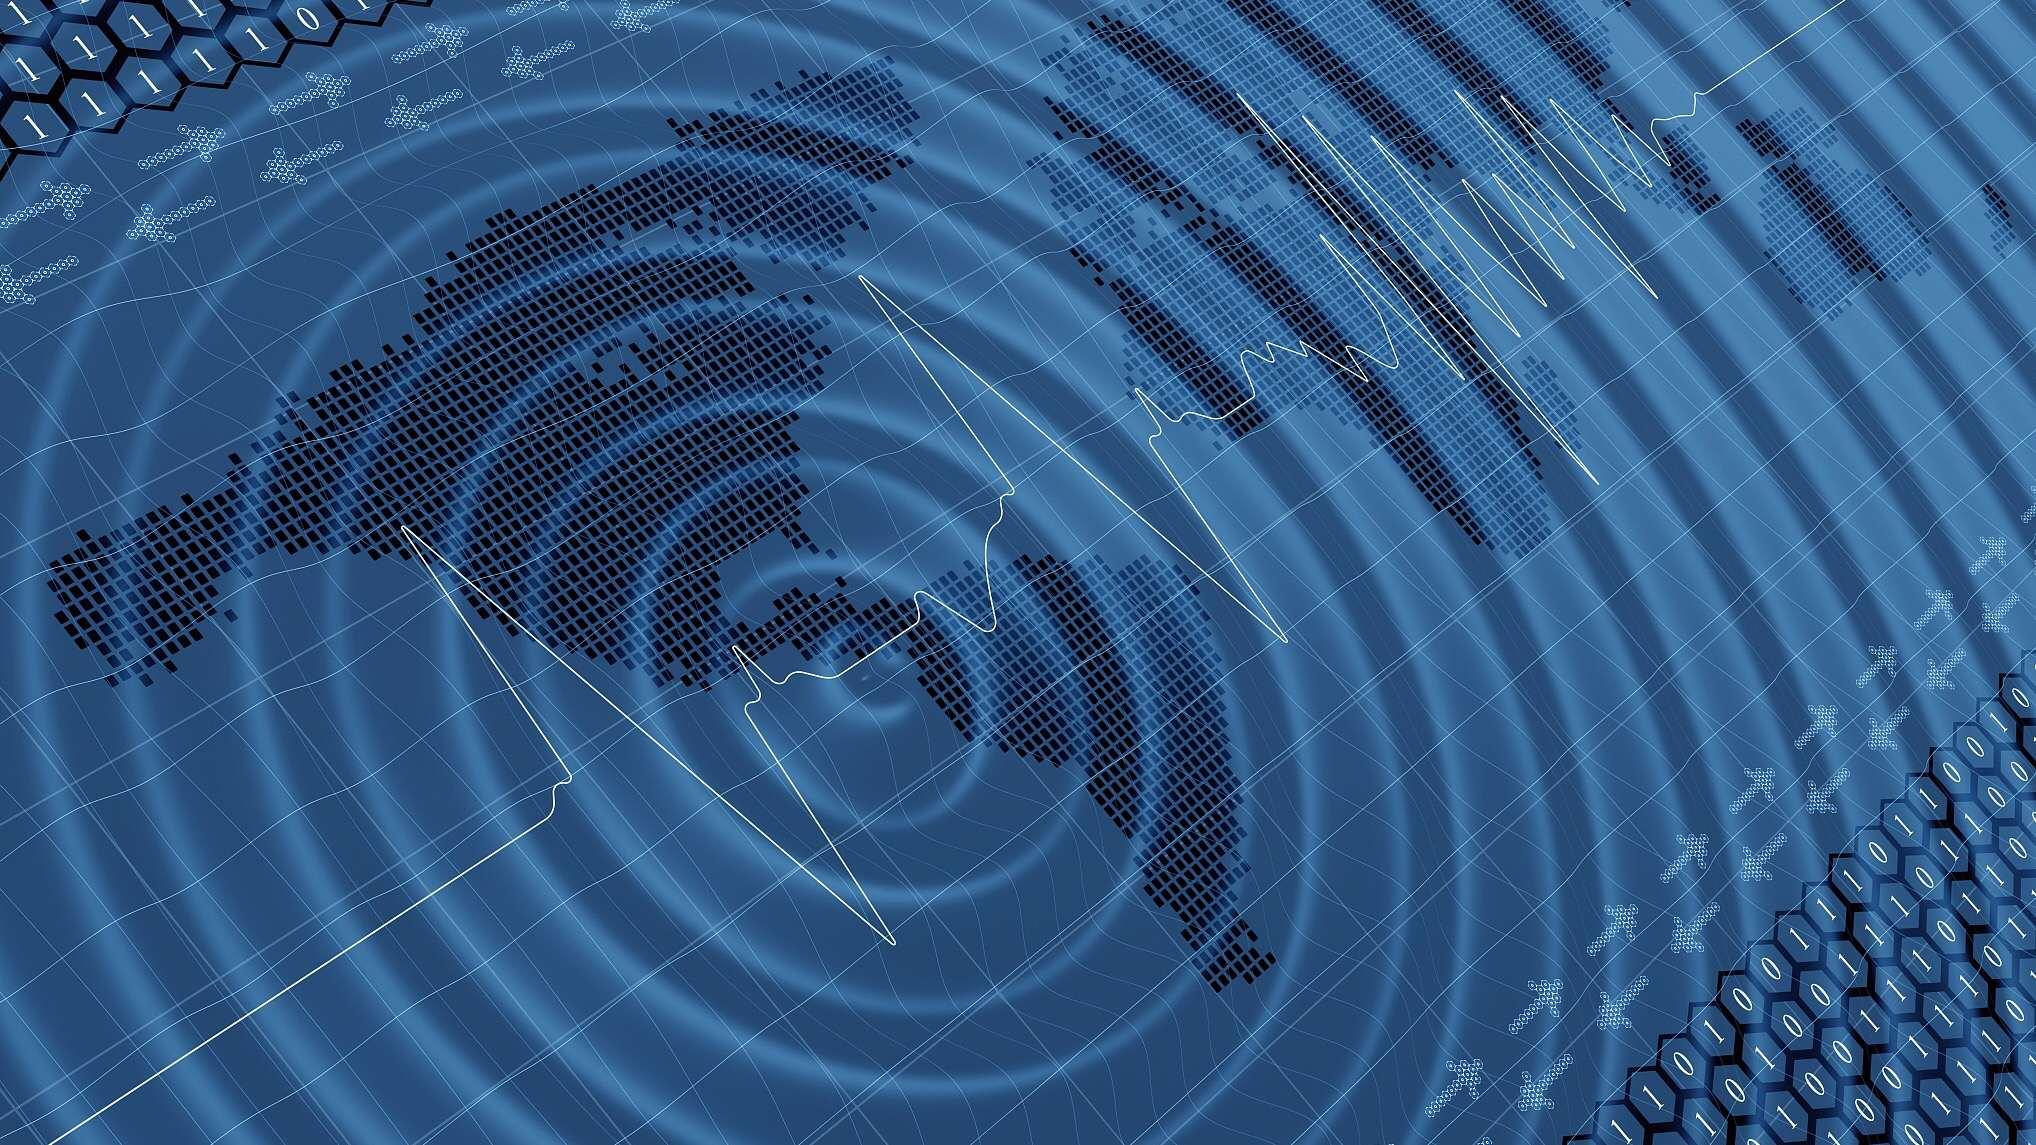 M6.2 earthquake hits city of Adak in Alaska